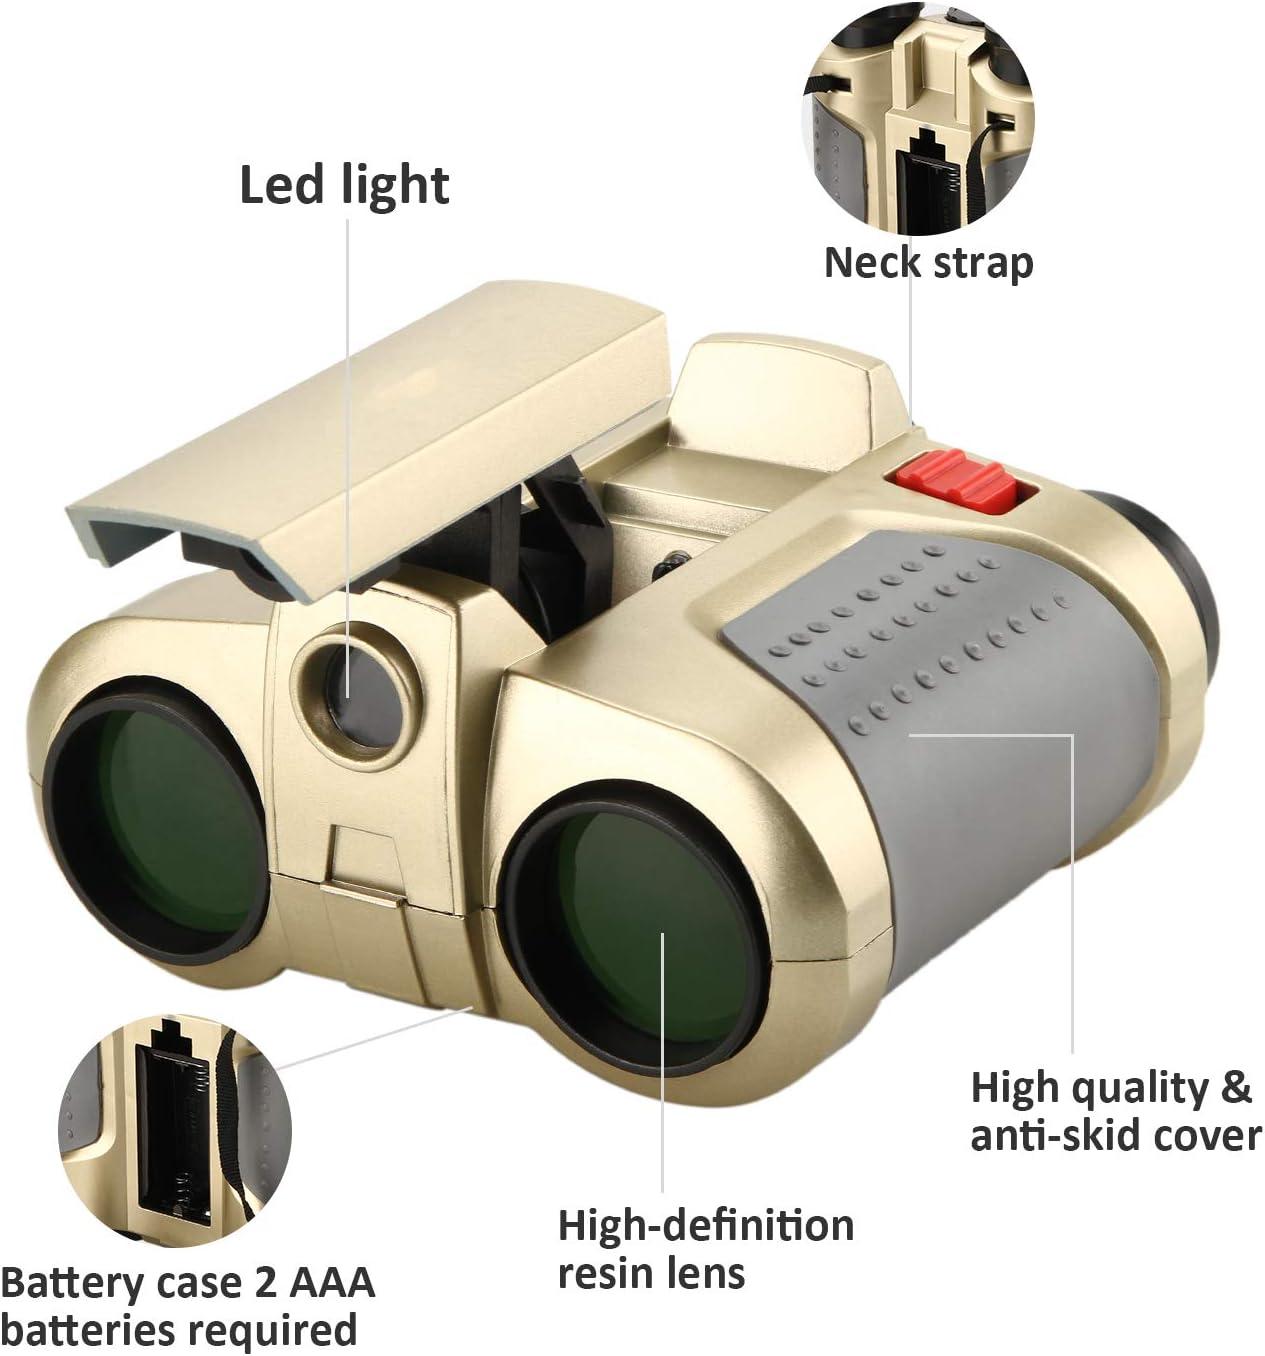 HQMaster 4x30mm Binocular Night Beam Vision Scope with Pop-up Spotlight Fun Cool Toy Gift for Kids Boys Girls